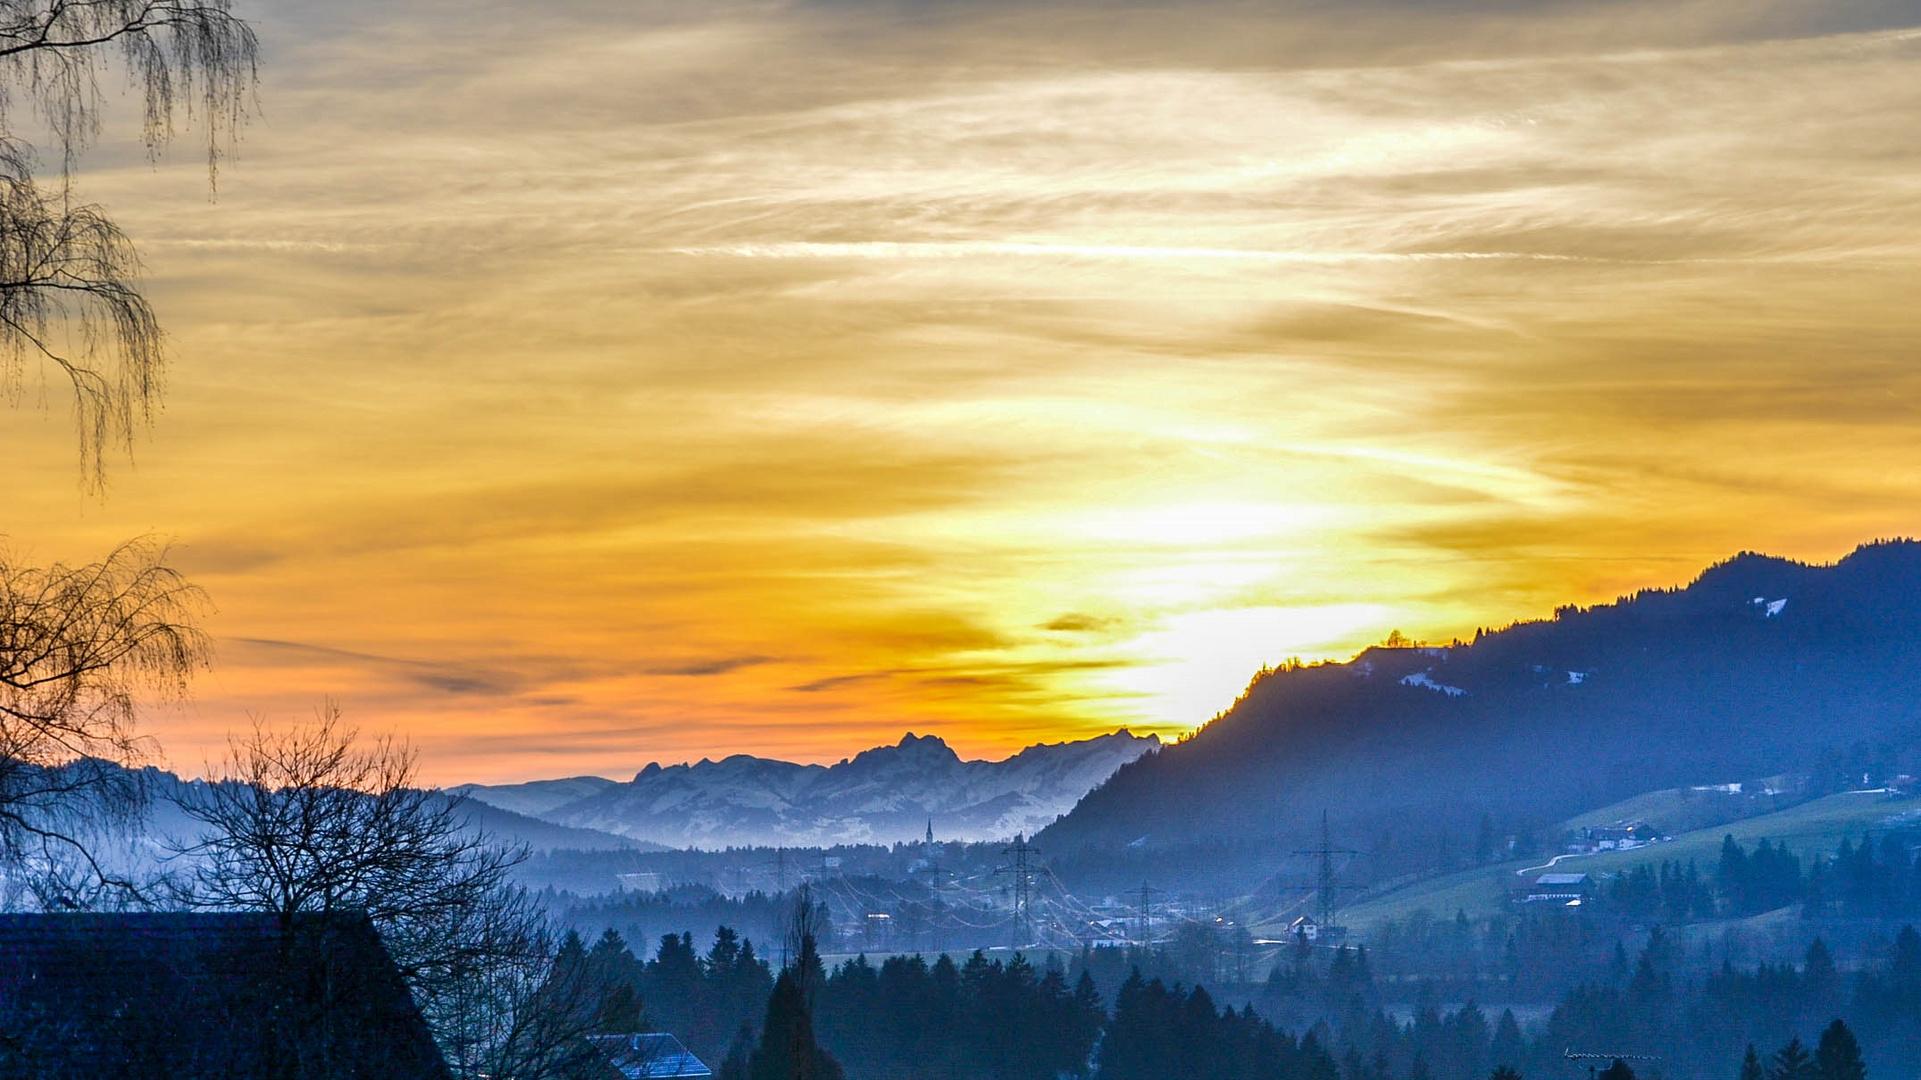 Sonnenuntergang über Langen bei Bregenz